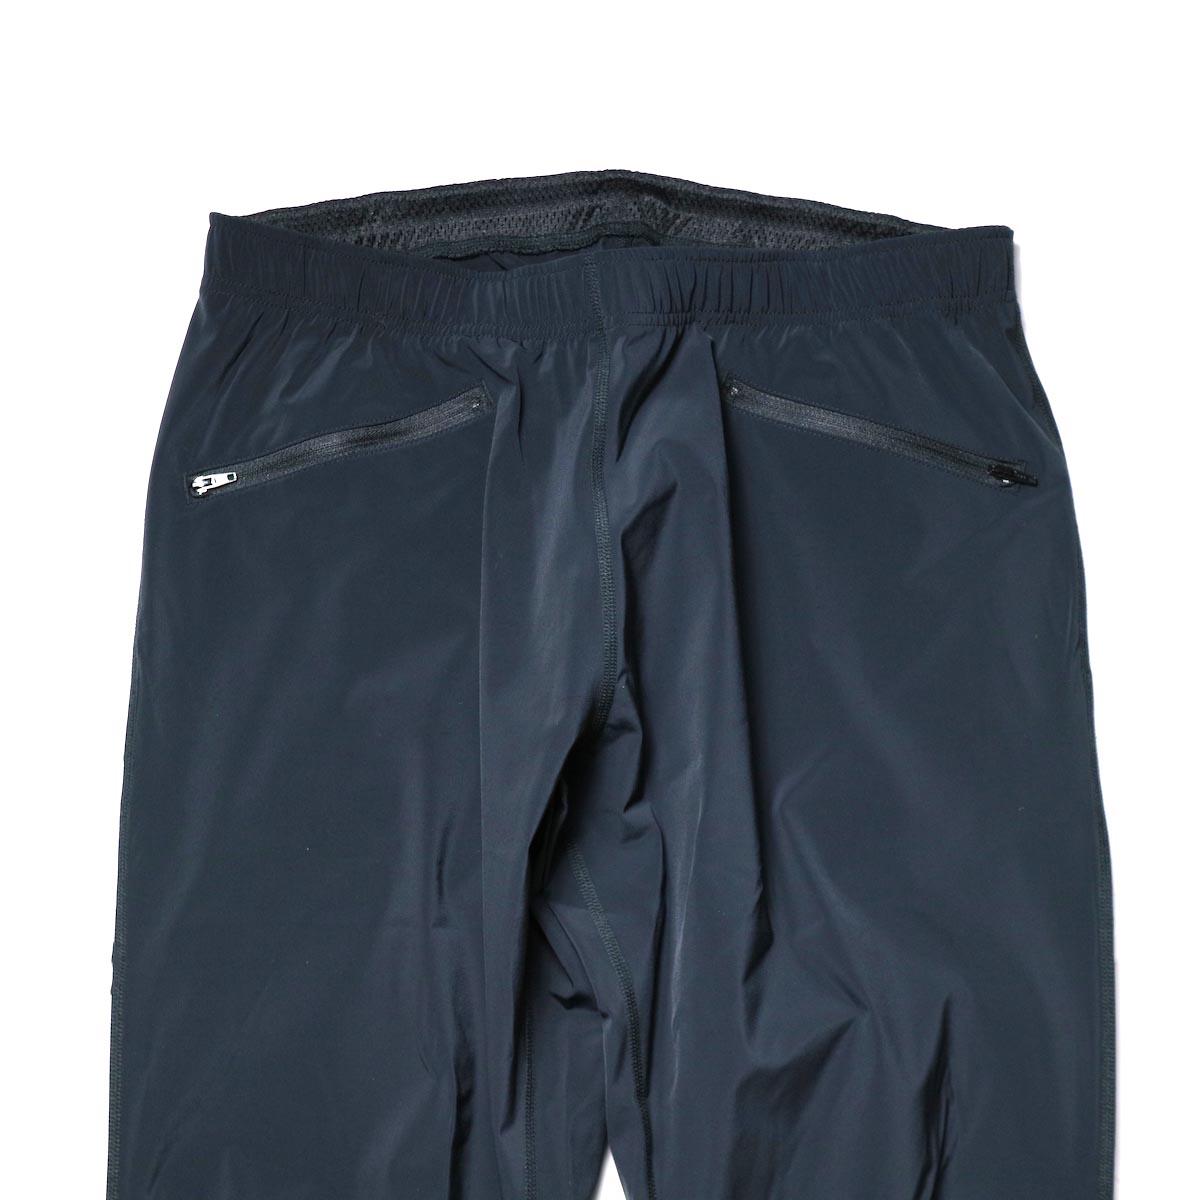 South2 West8 / 2P Cycle Pant -N/Pu Taffeta (Black)正面ポケット